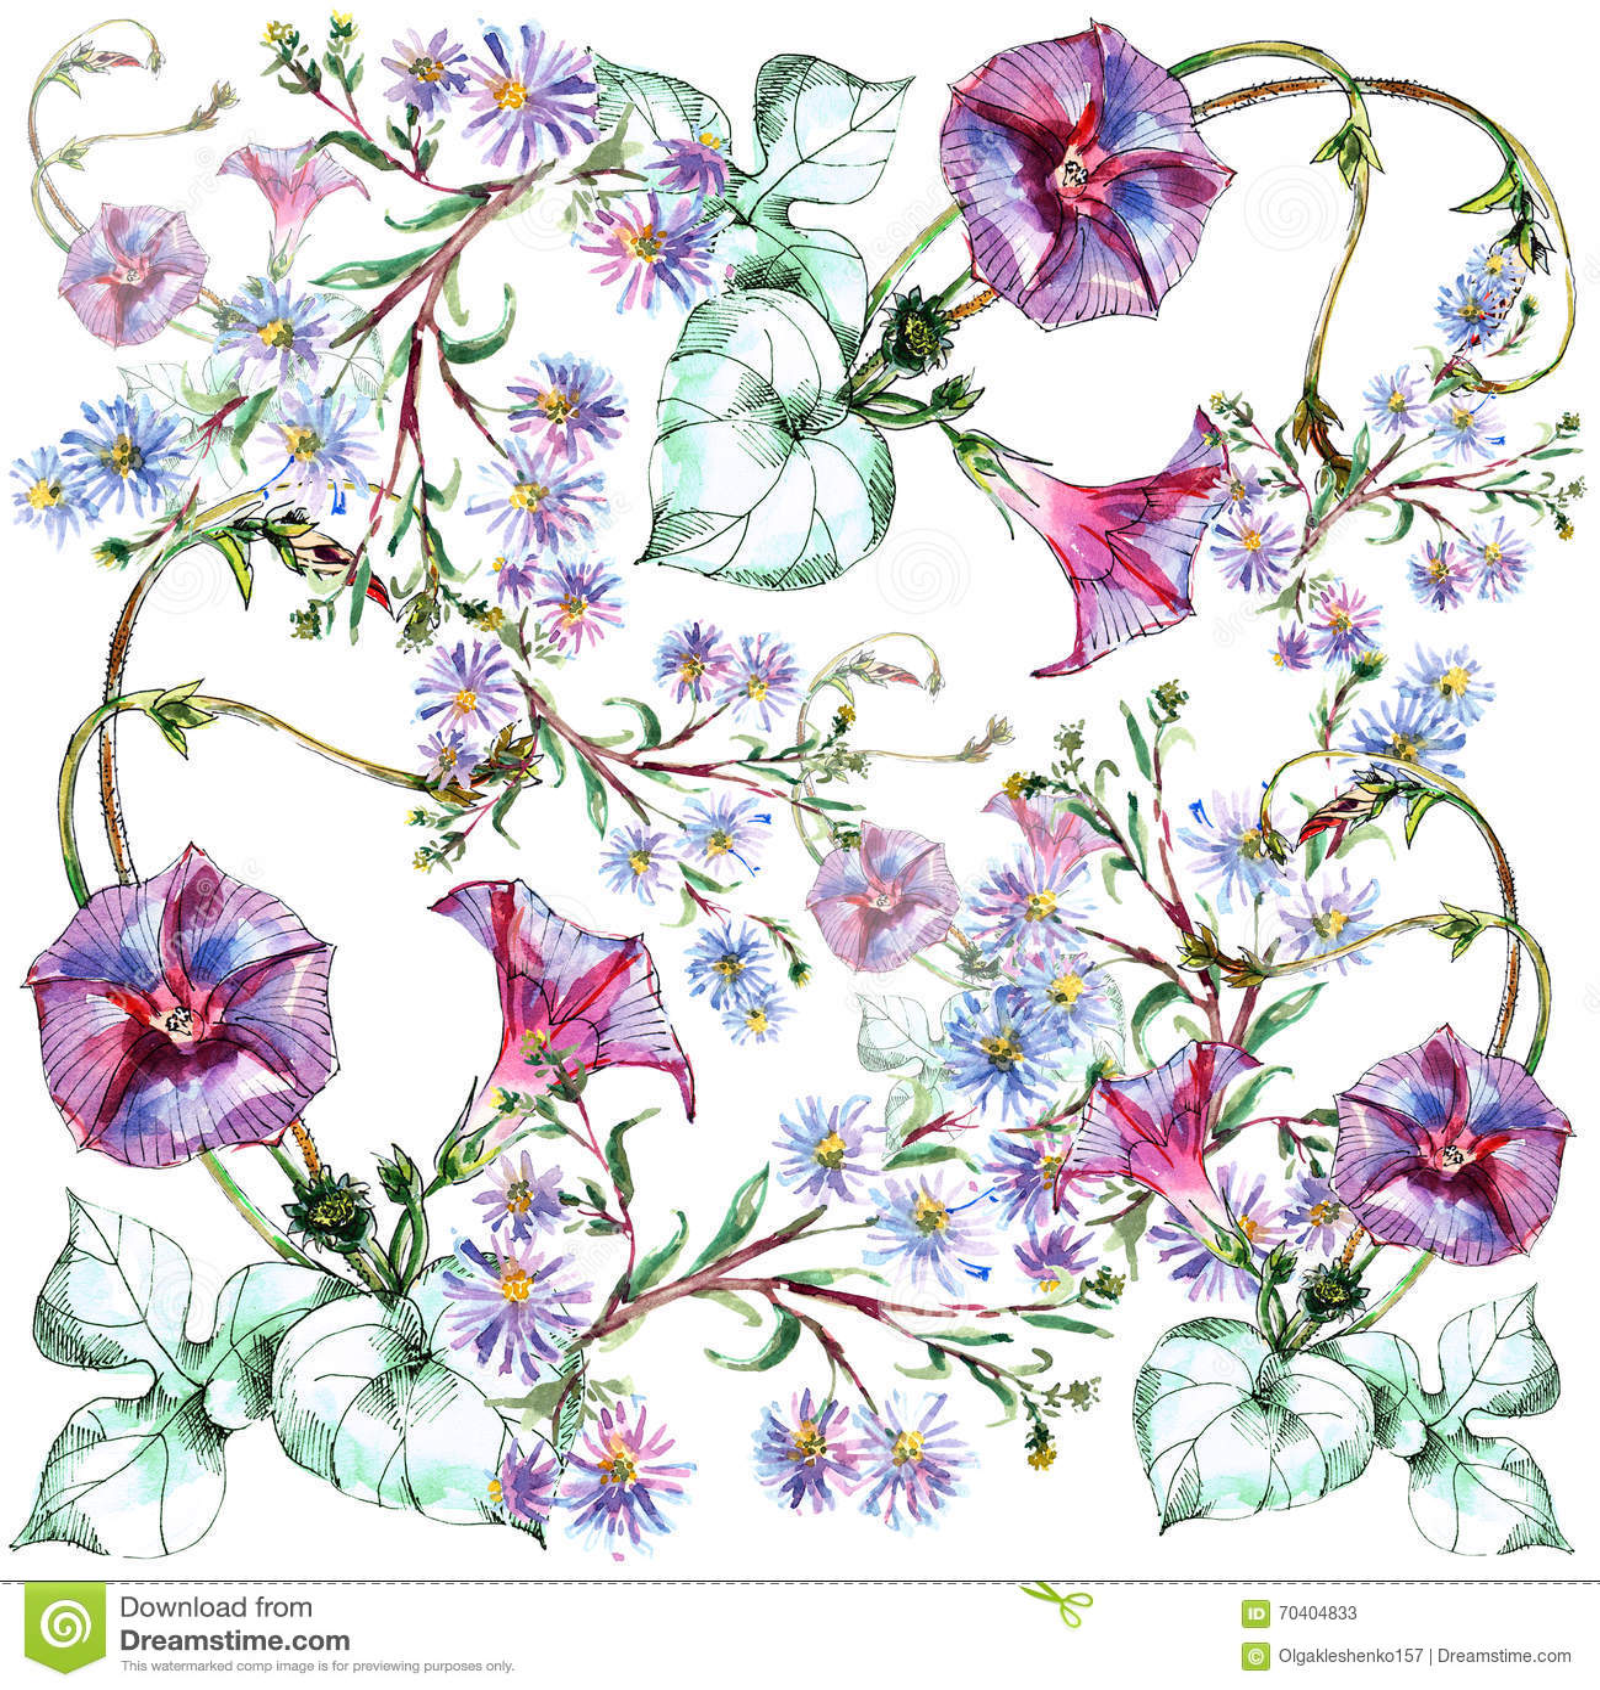 liseron bouquet bleu de fleur aquarelle mod le illustration stock illustration 70404833. Black Bedroom Furniture Sets. Home Design Ideas